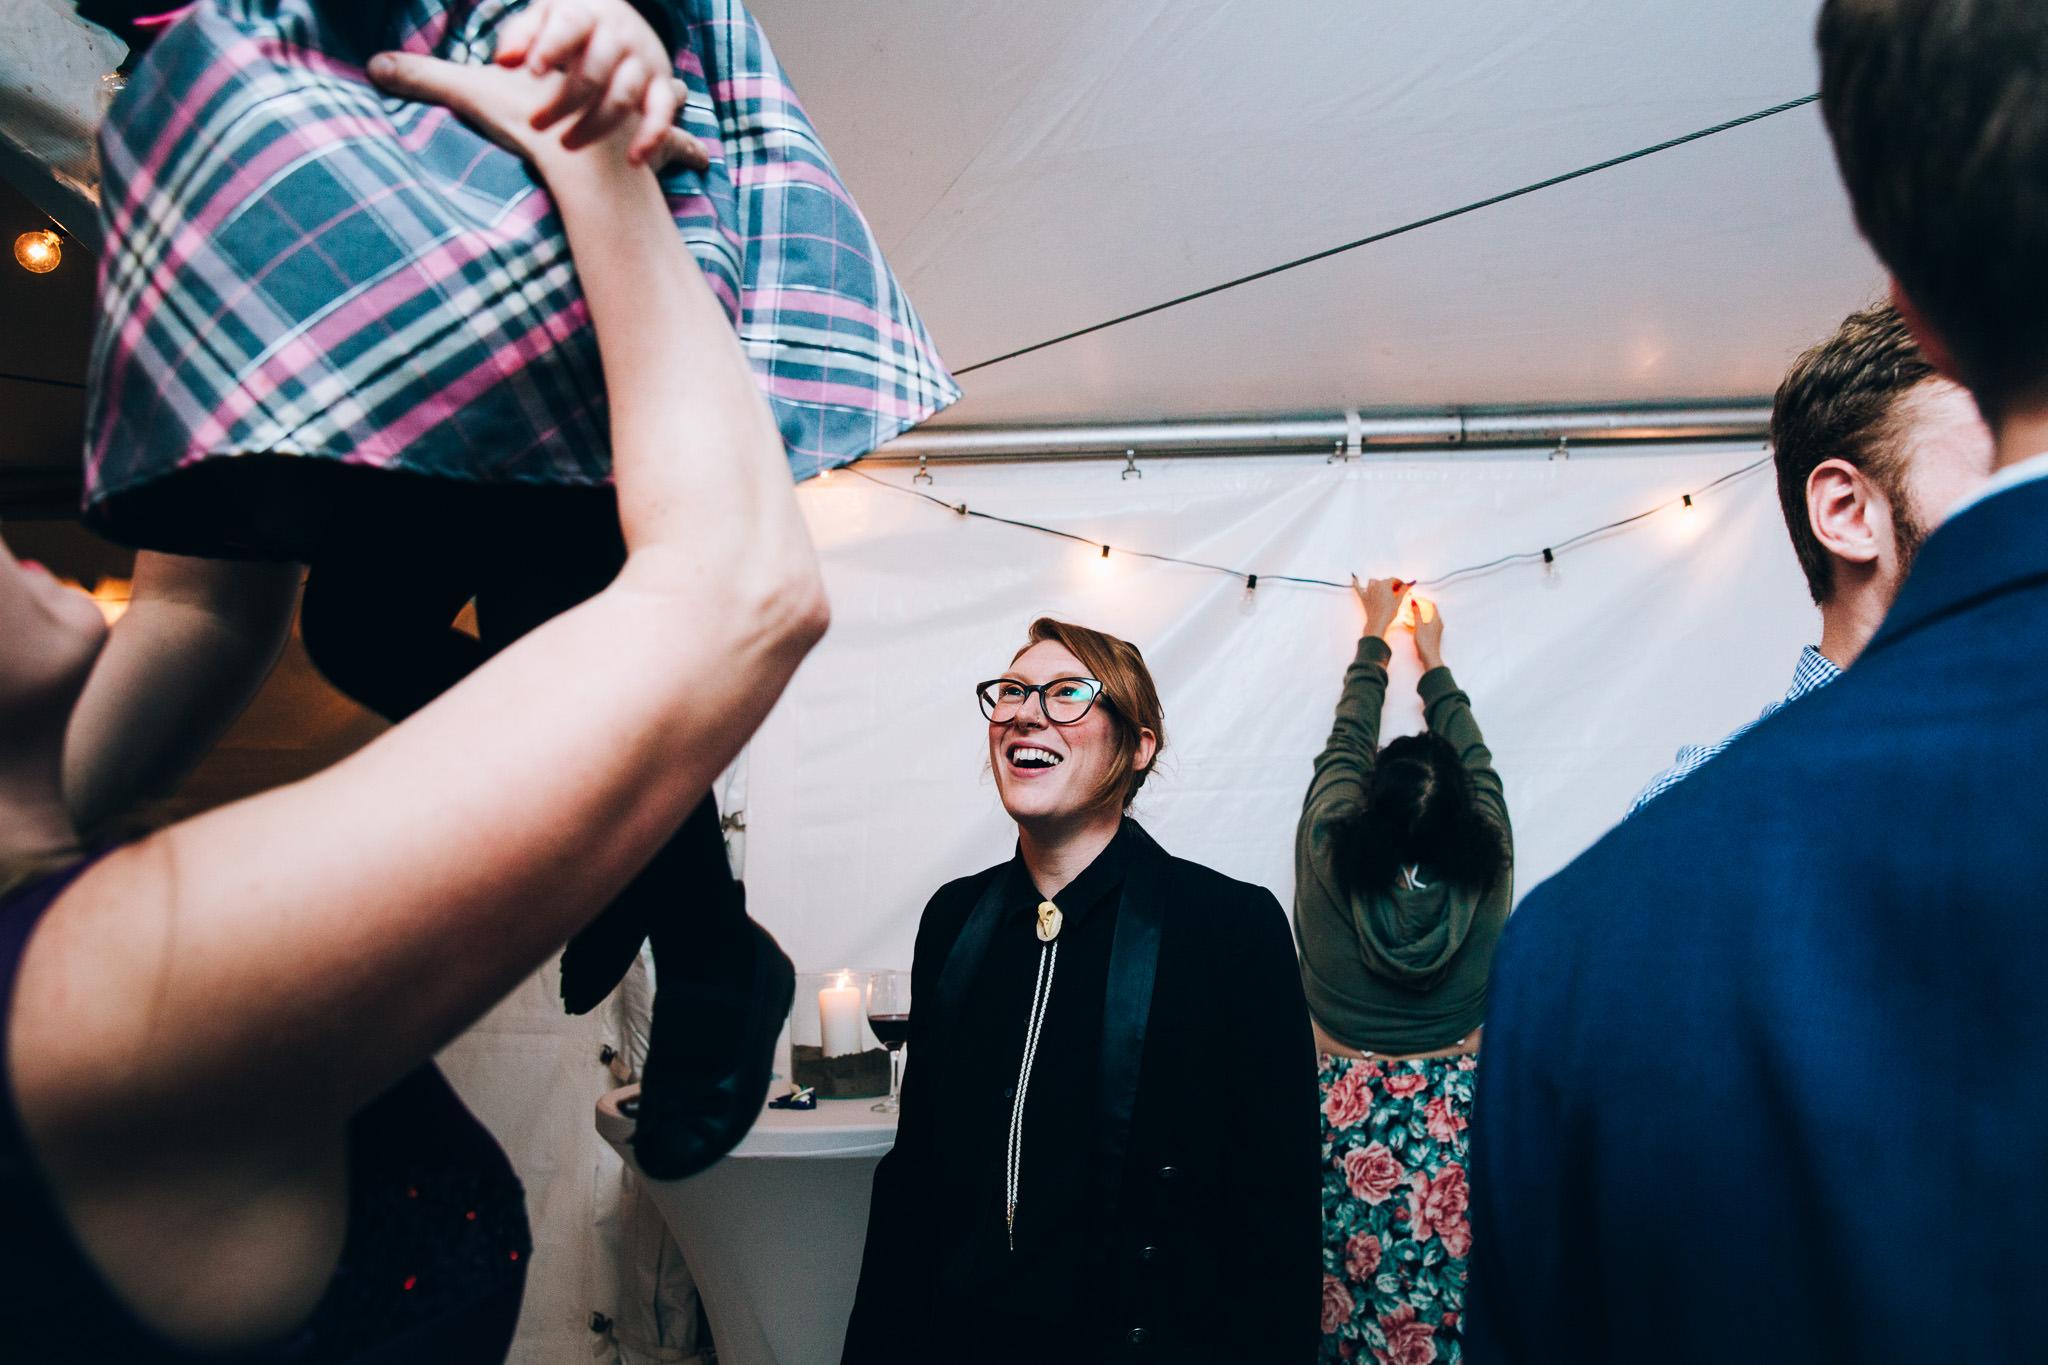 084_Canada-documentary-wedding-photograp